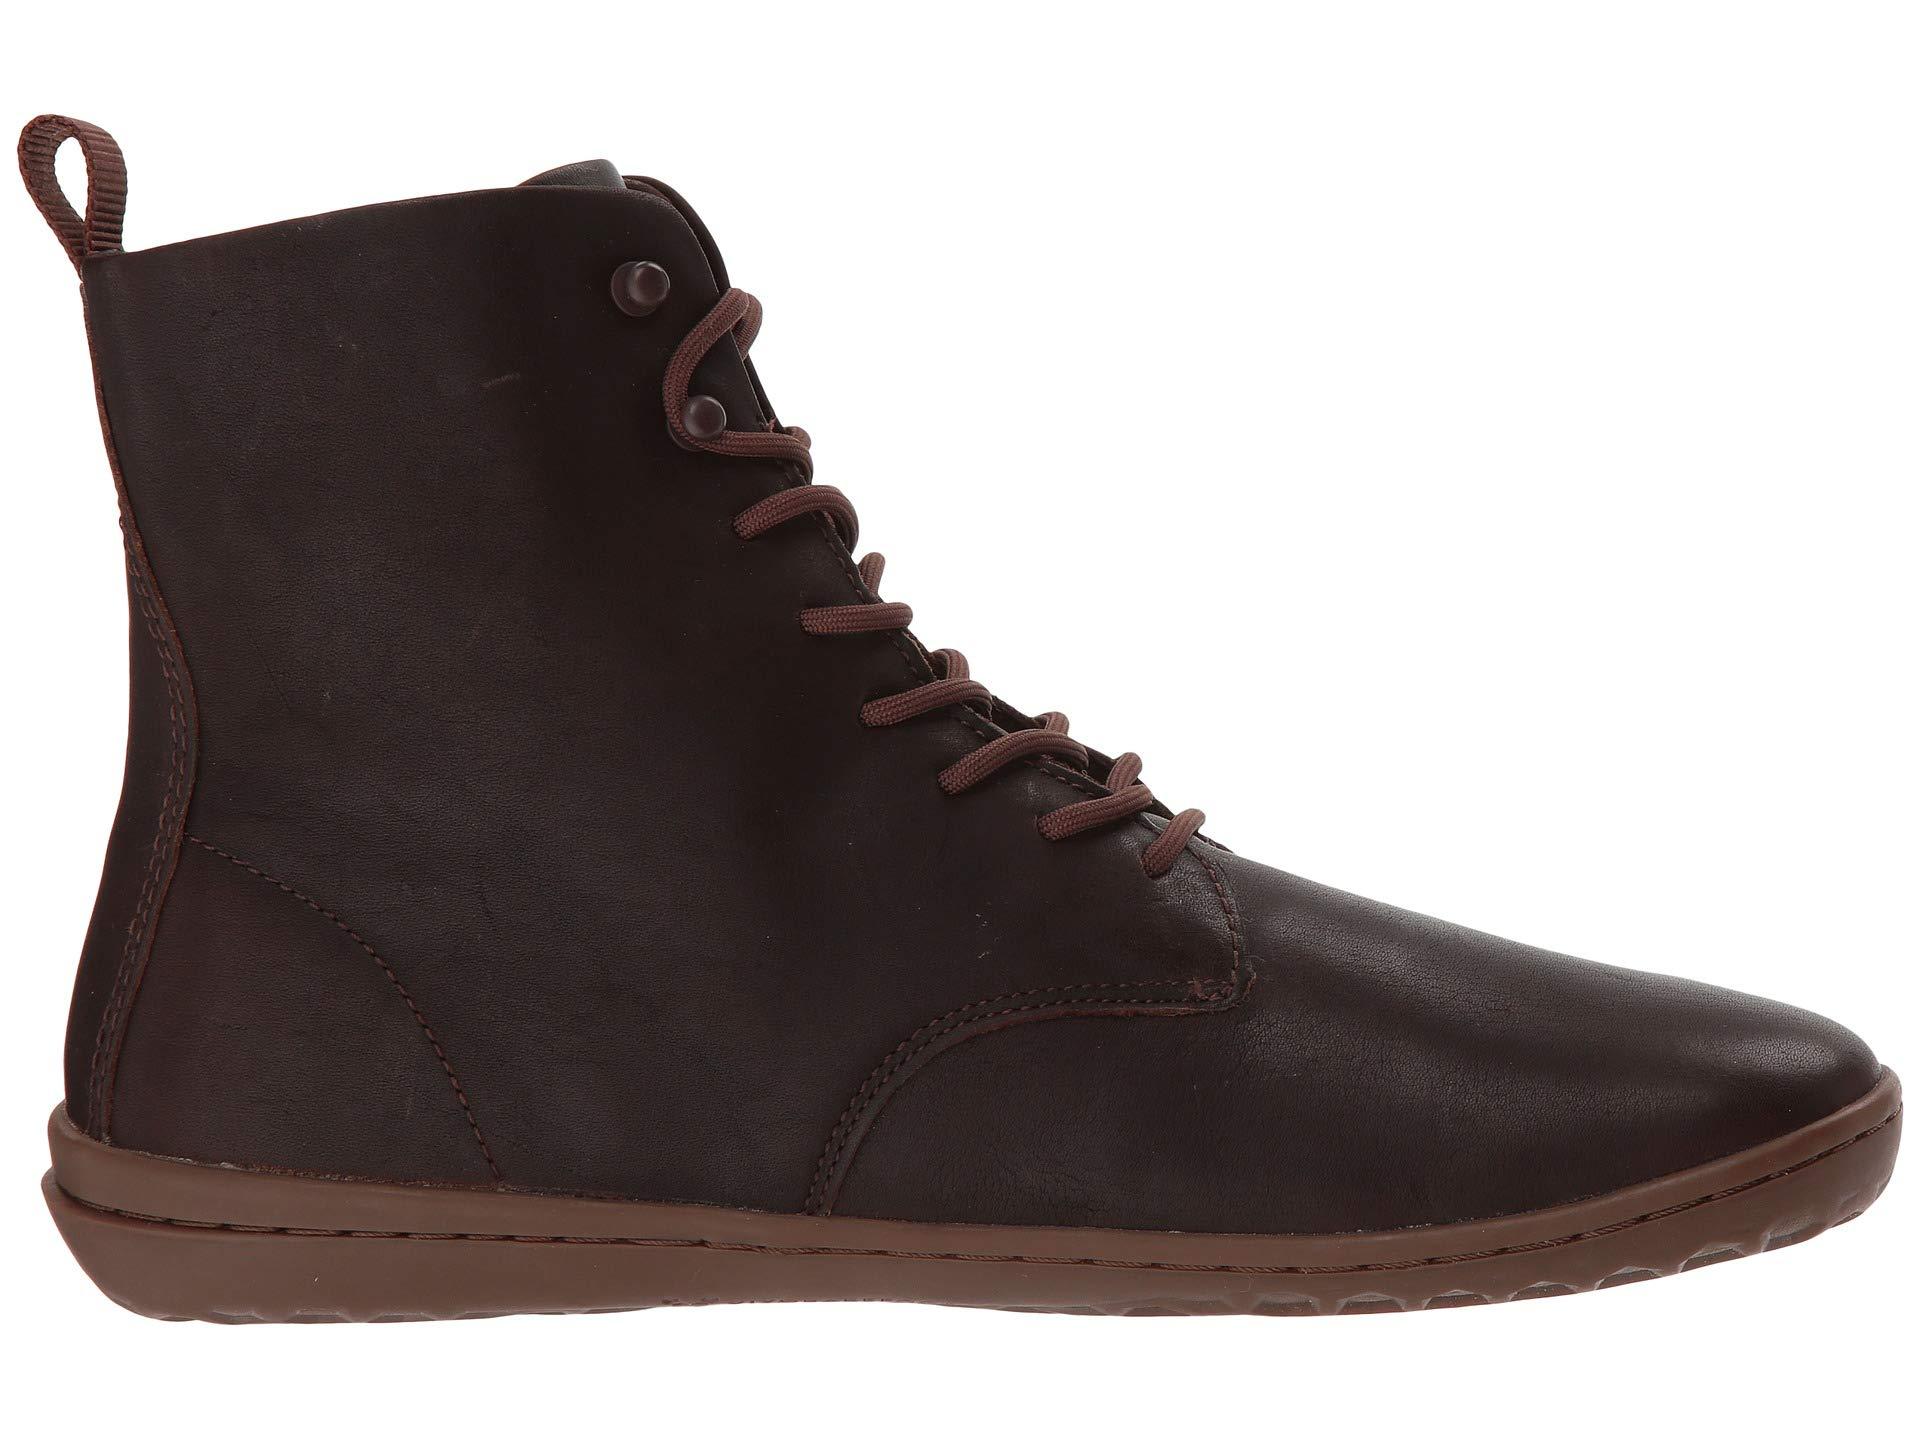 0 Leather Gobi 2 Hi Brown Vivobarefoot qzAZav